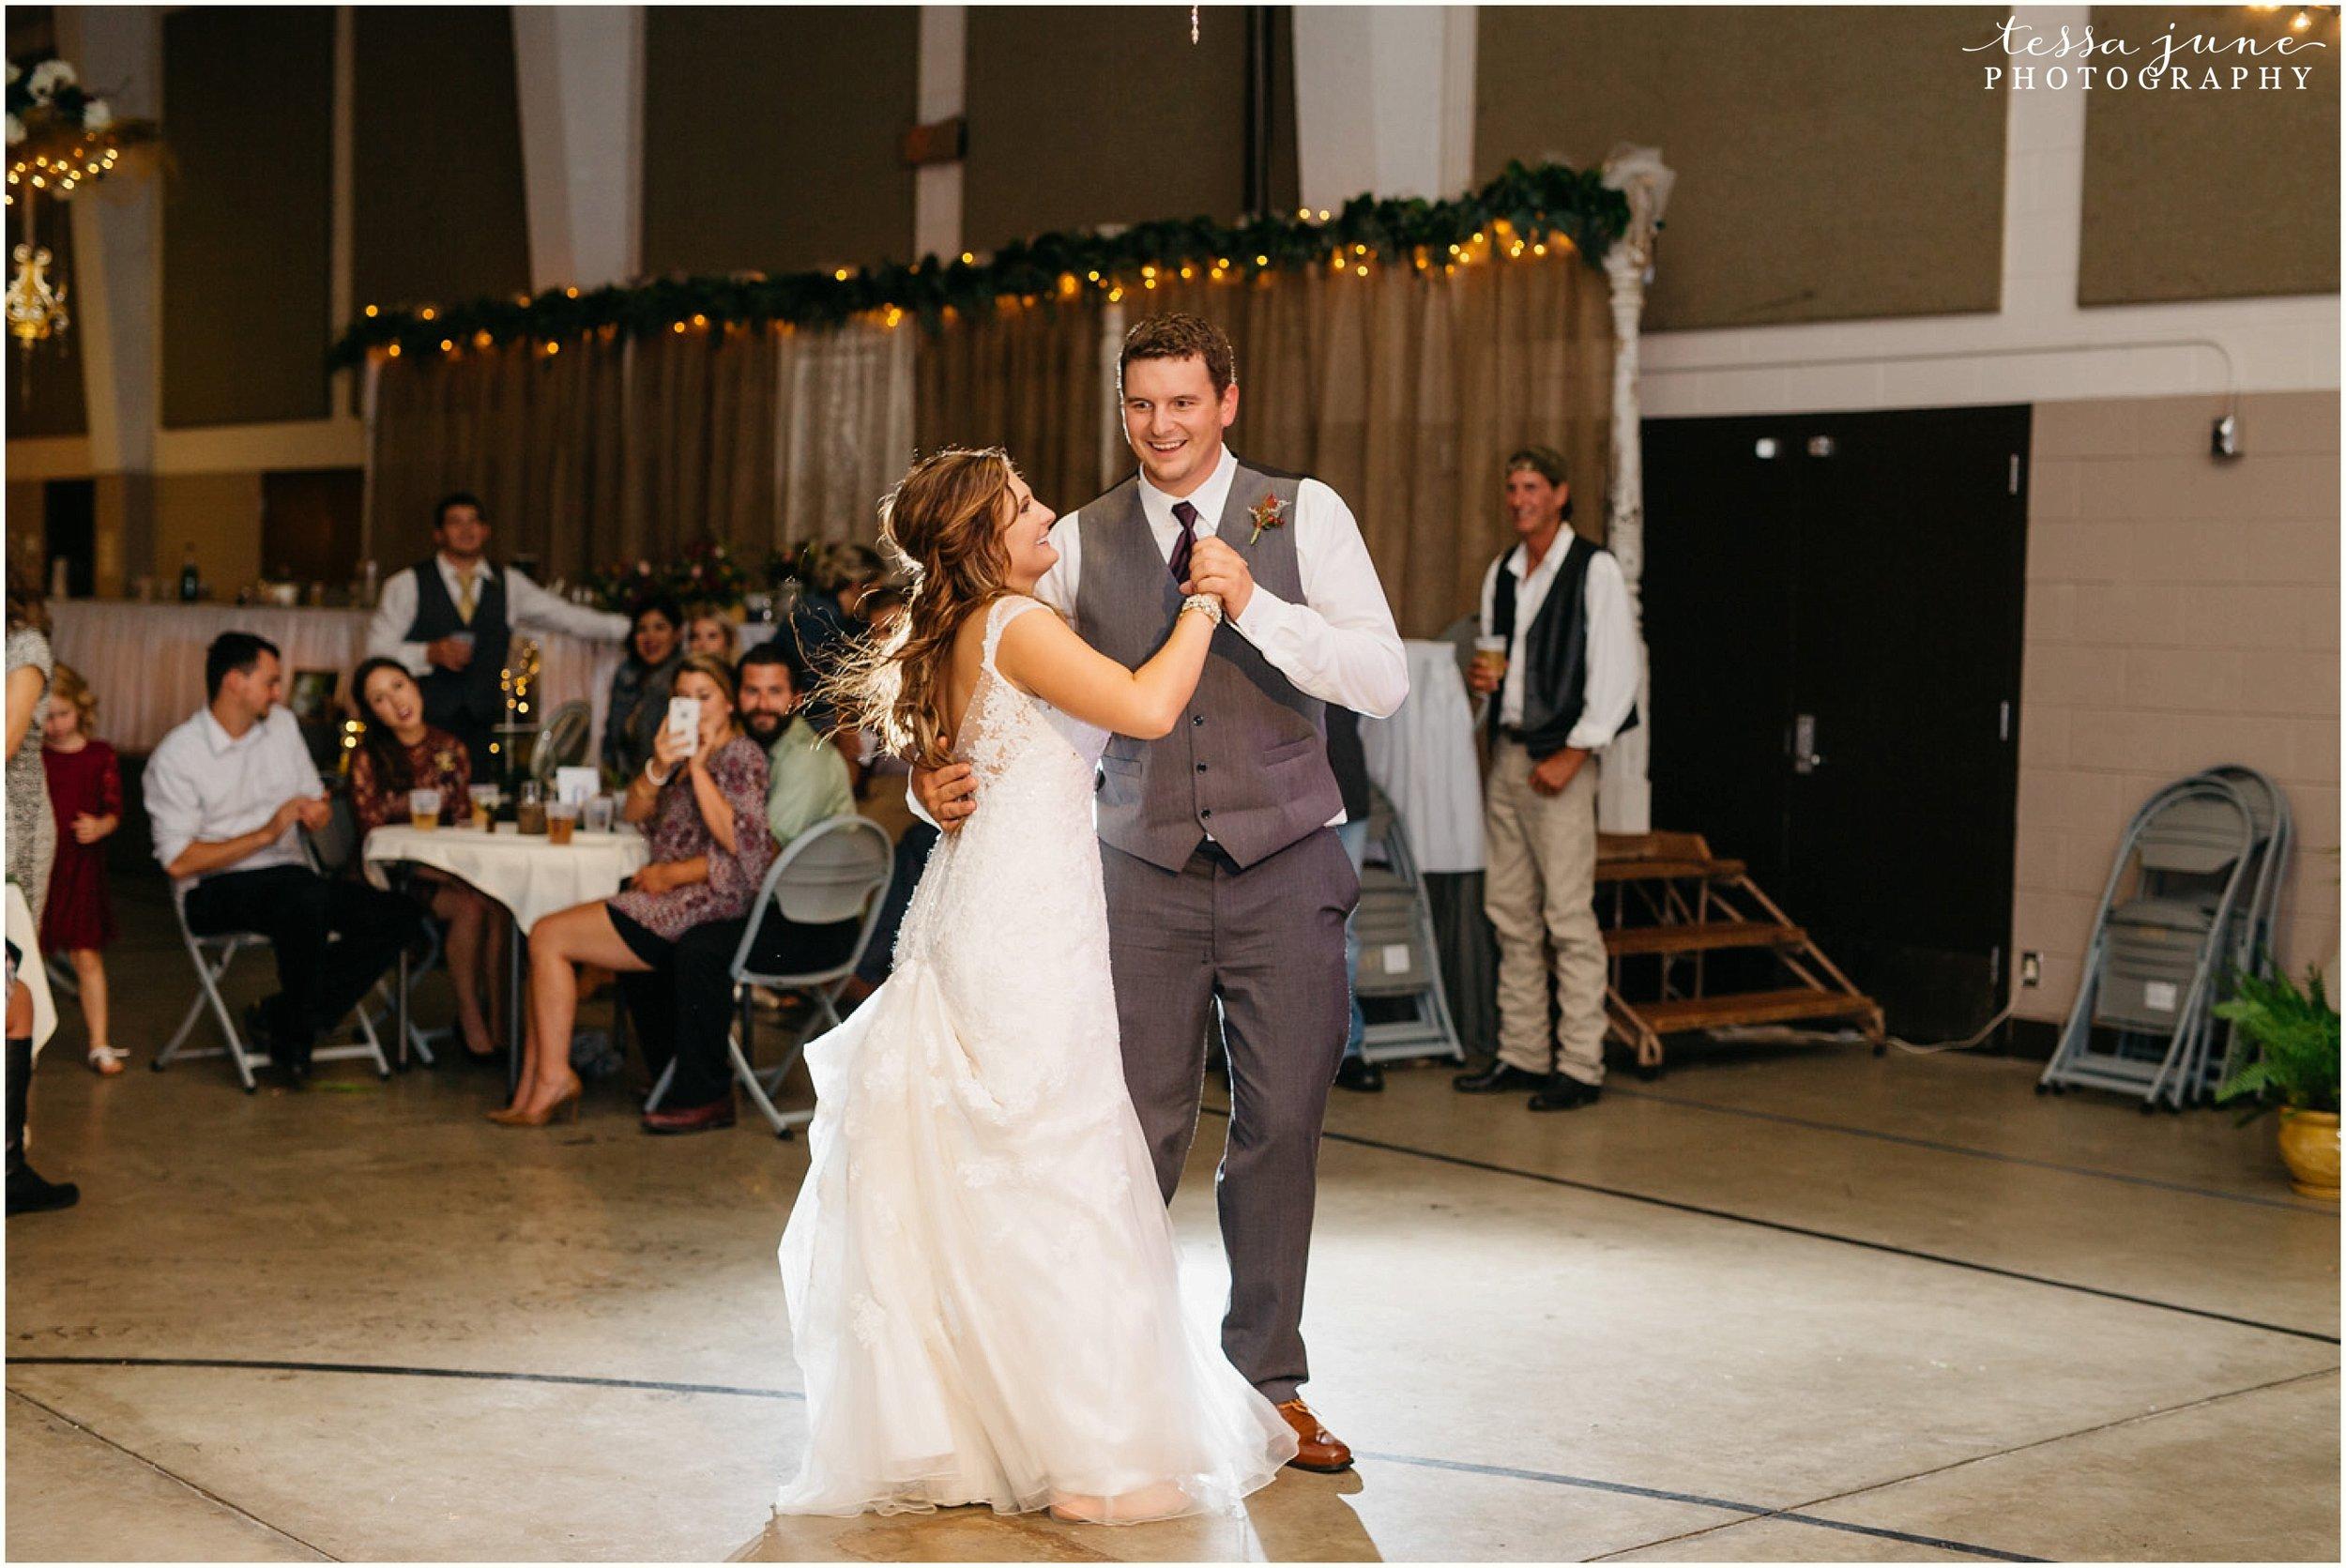 bohemian-minnesota-wedding-mismatched-bridesmaid-dresses-waterfall-st-cloud-tessa-june-photography-197.jpg